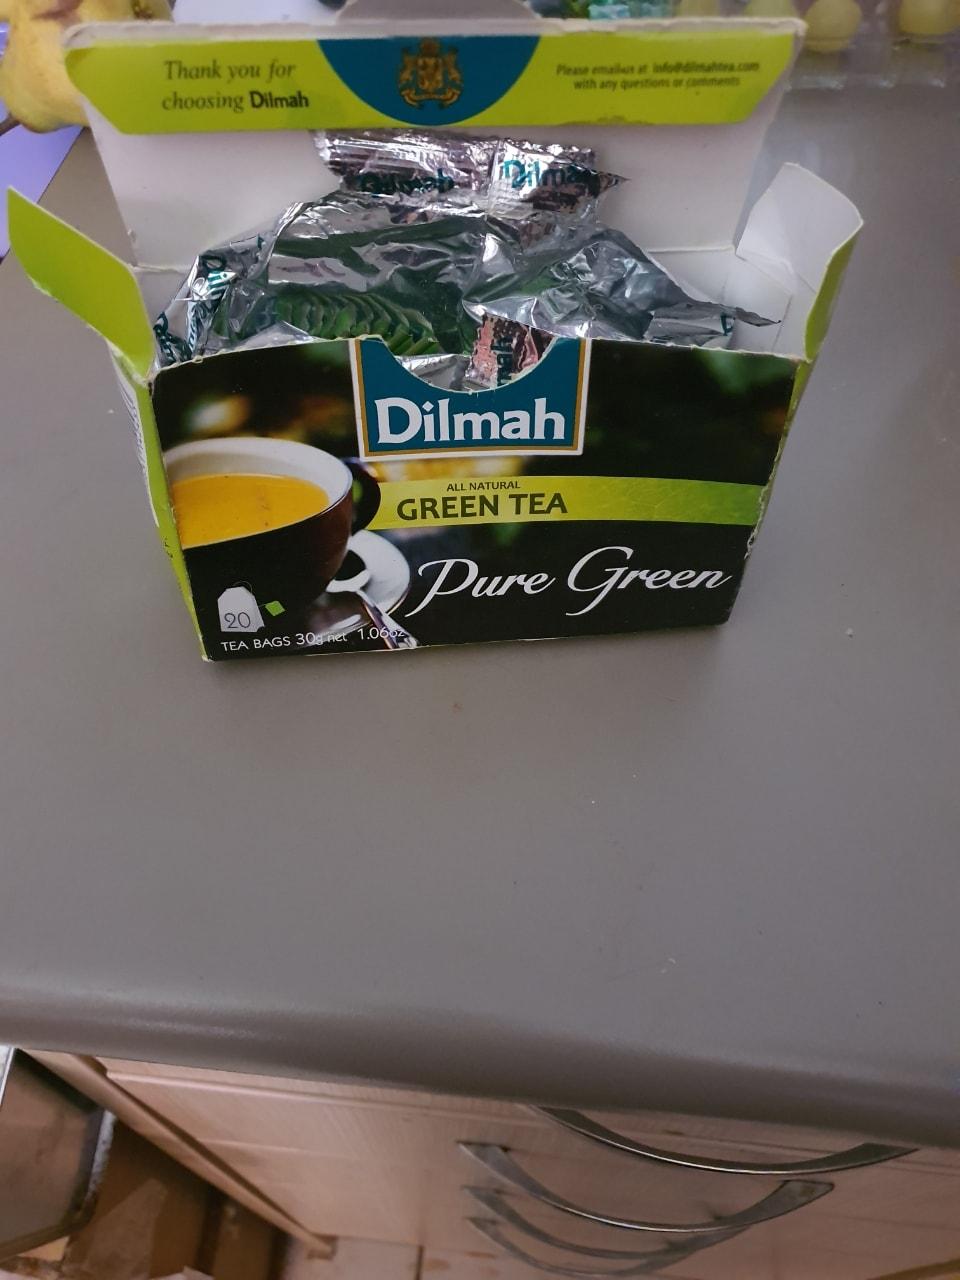 Dilmah Green Tea bags